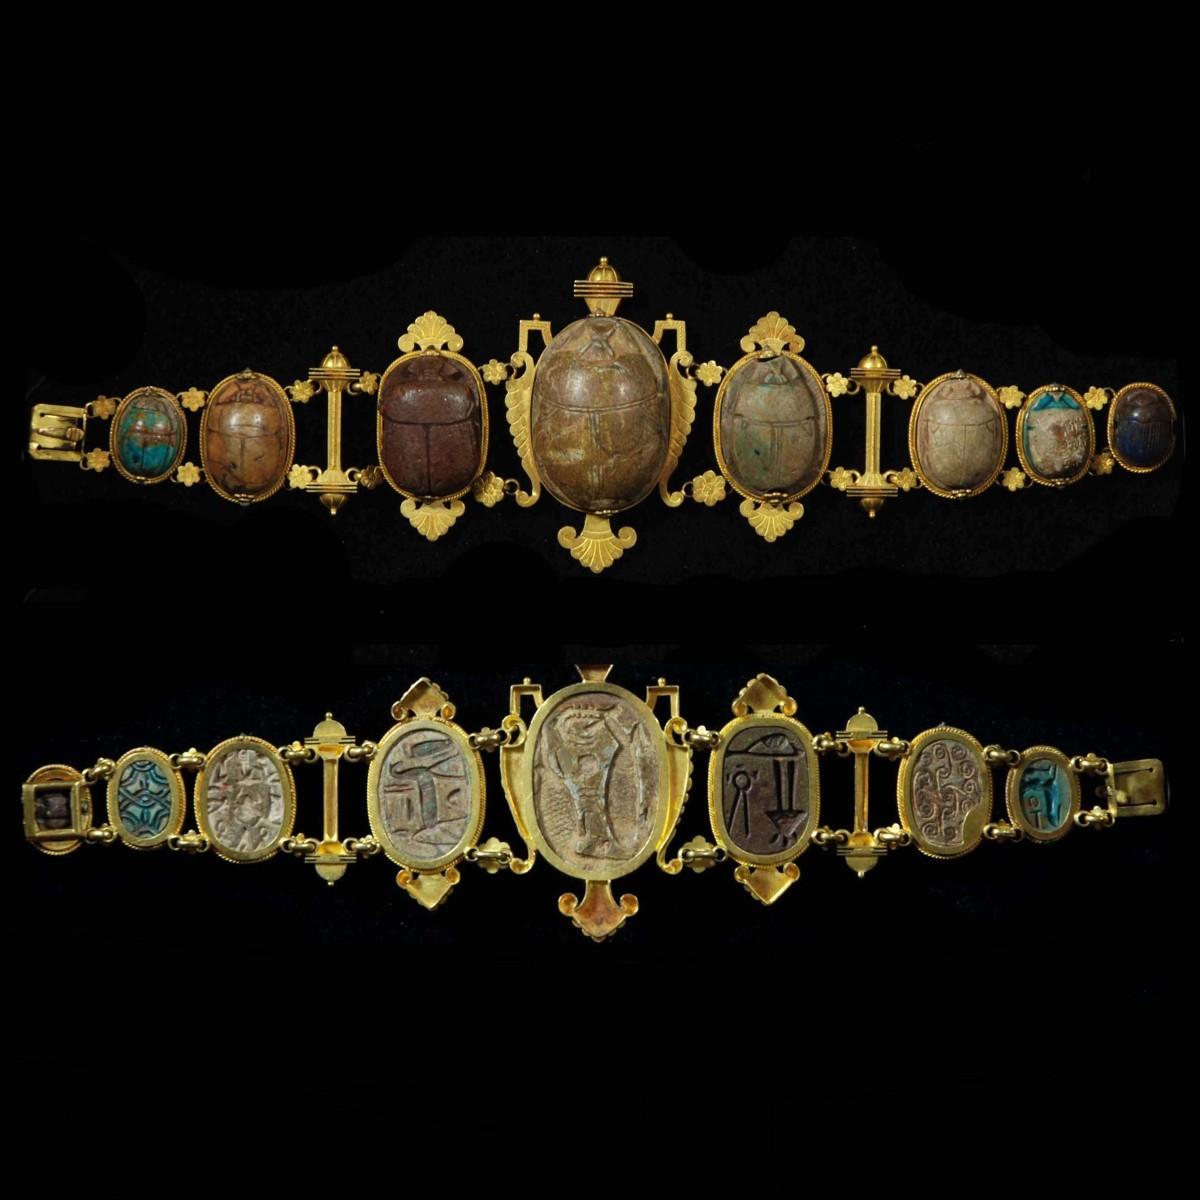 Egyptian gold jewelery with scarabs bracelet